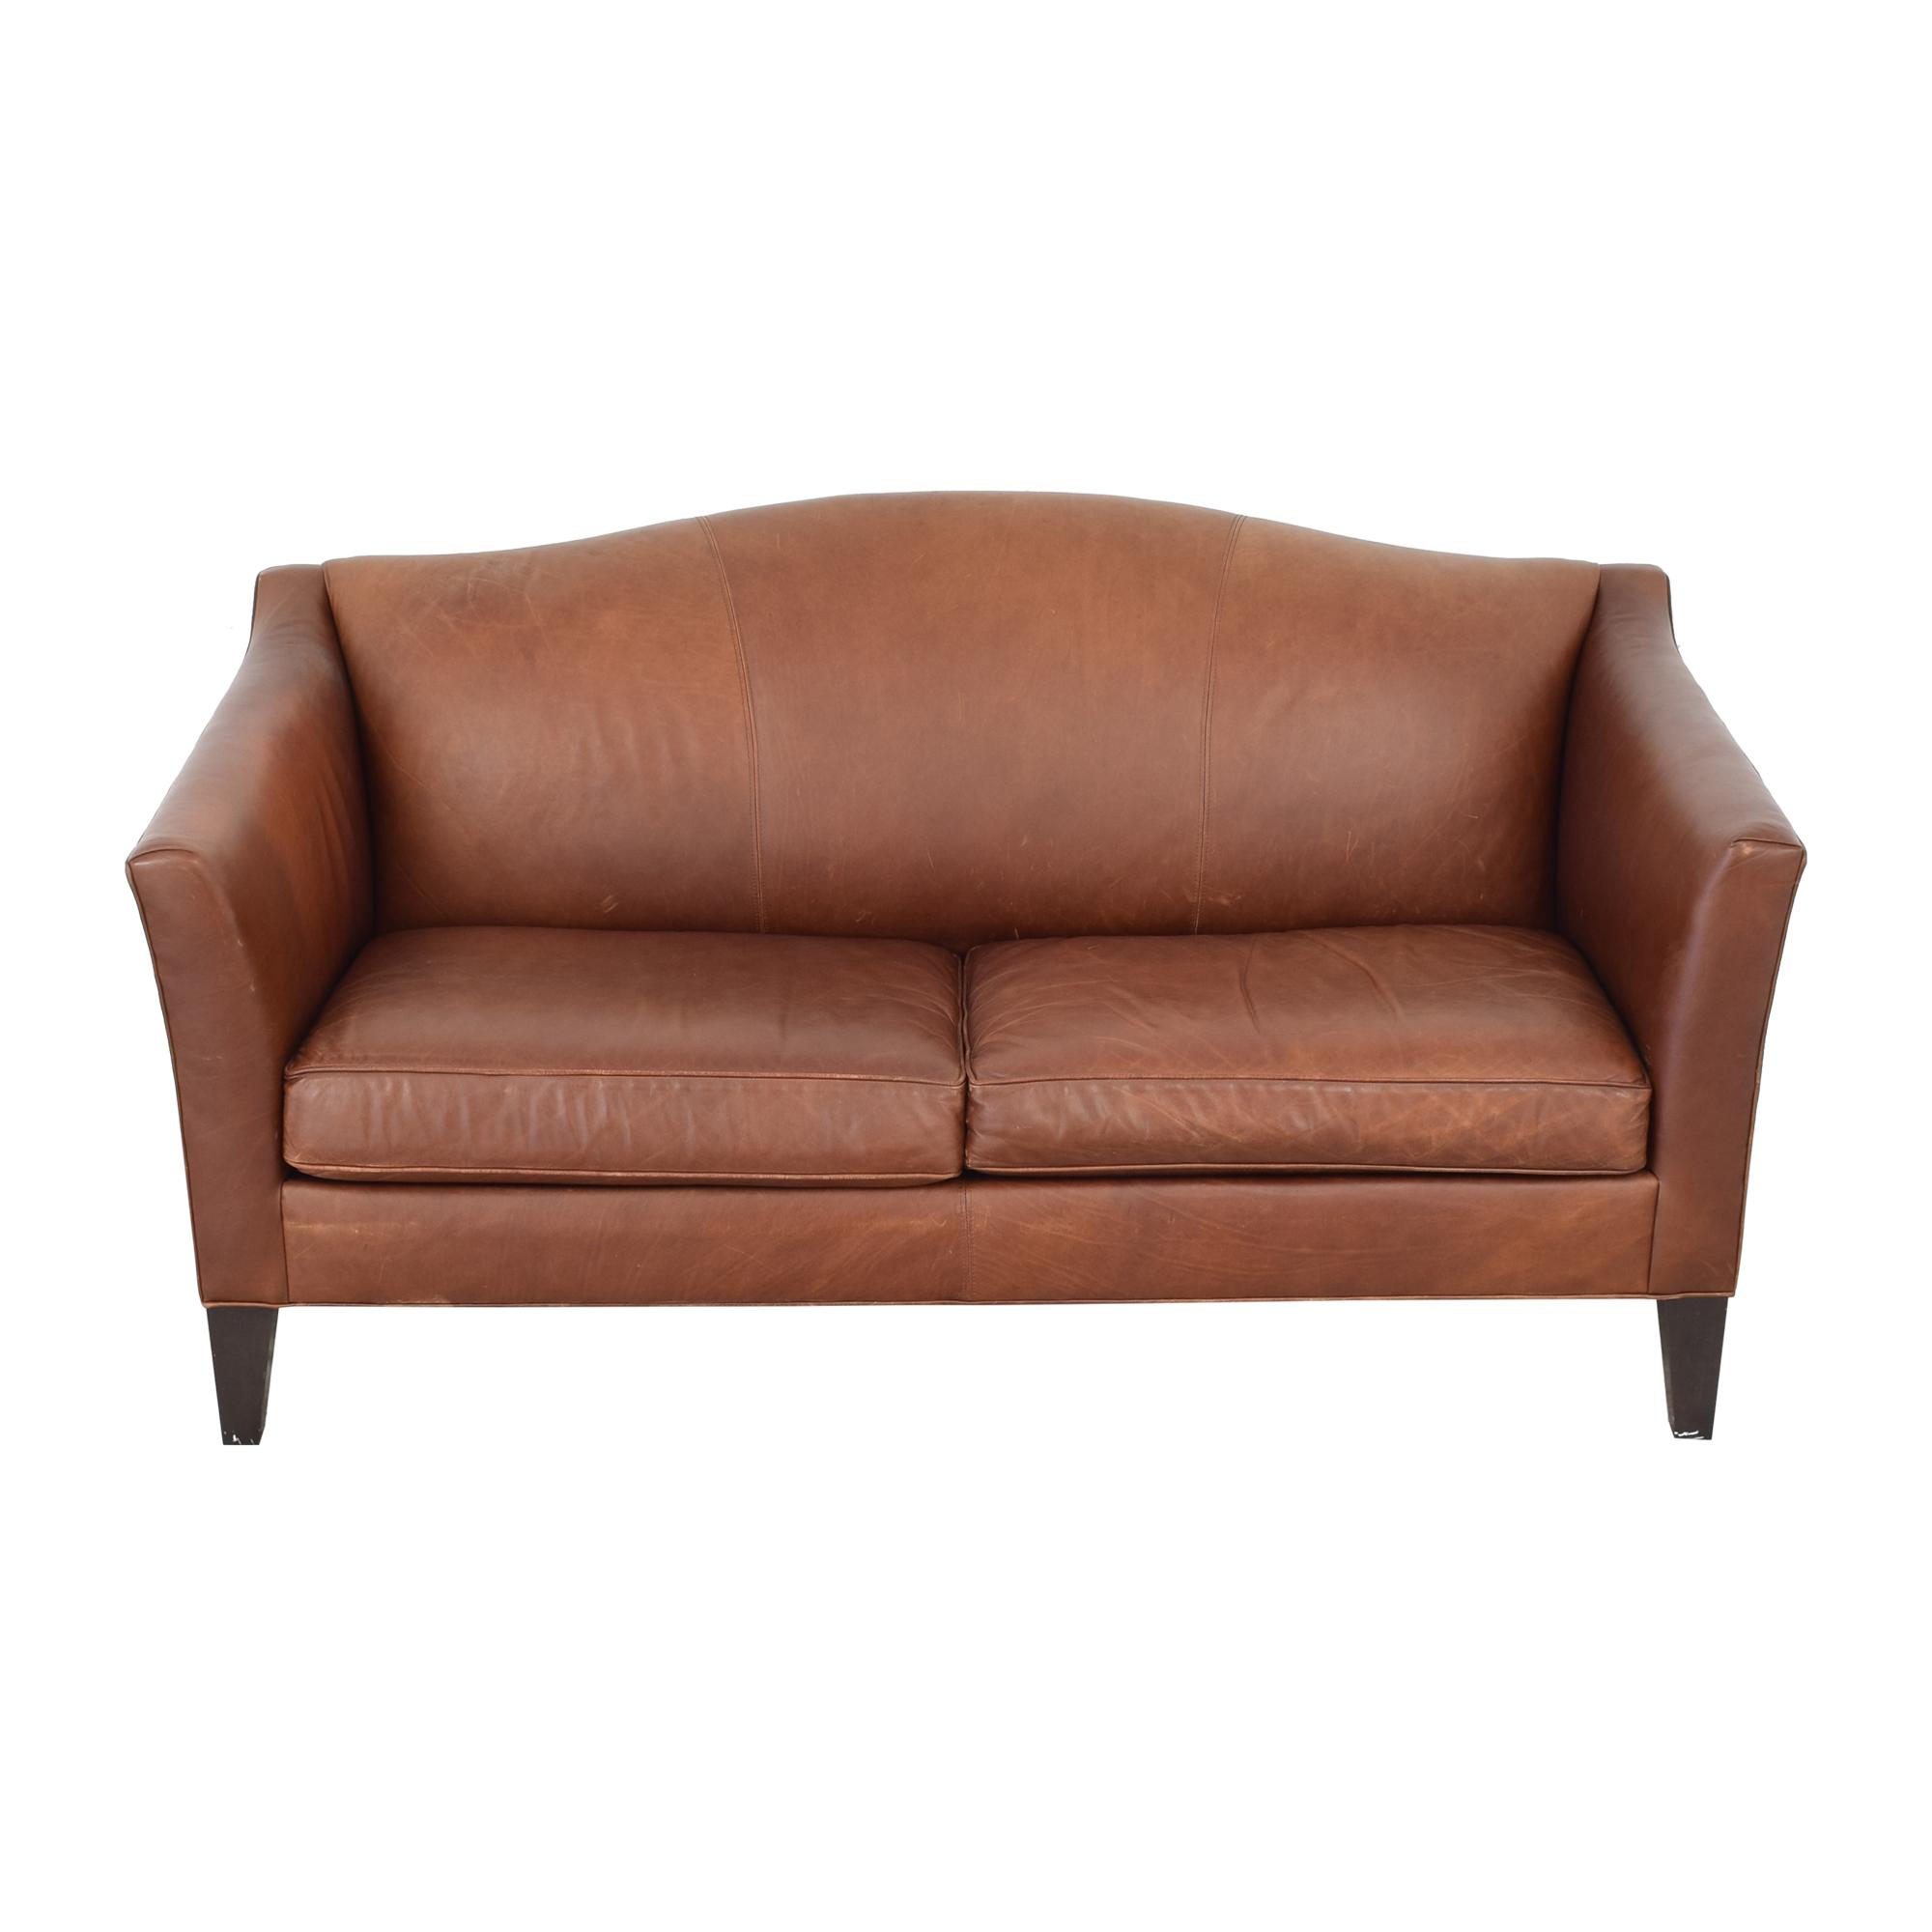 Ethan Allen Ethan Allen Leather Camelback Sofa Classic Sofas